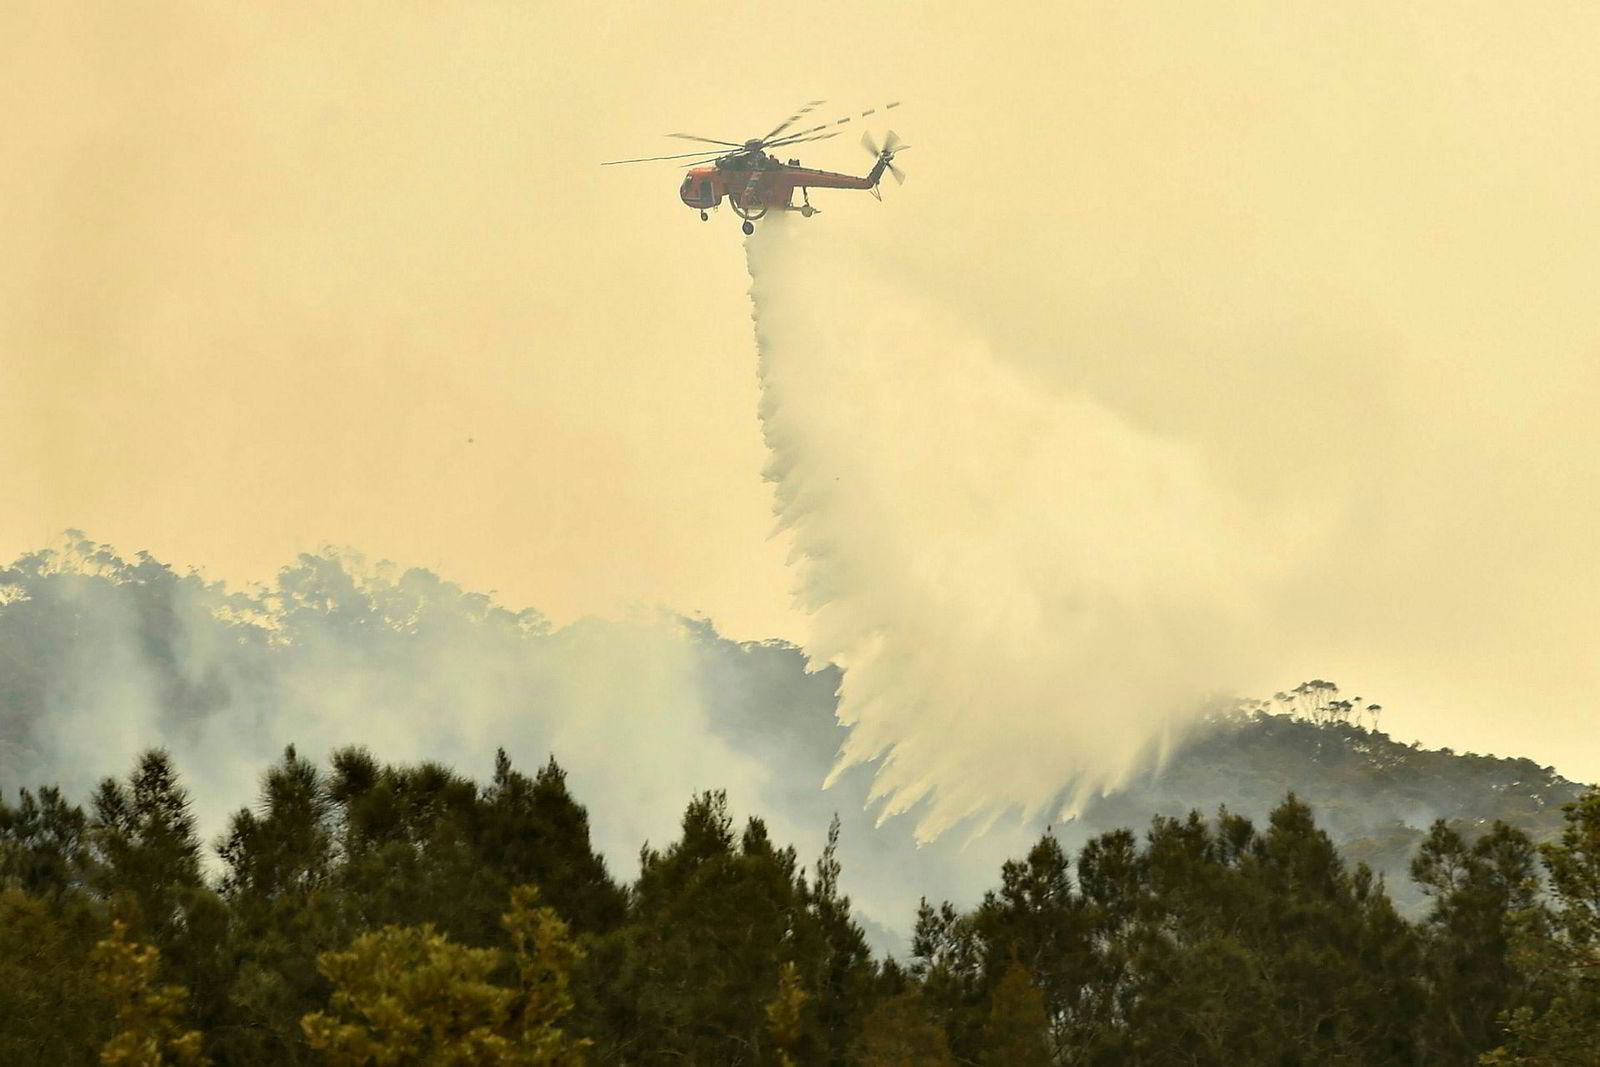 Slukkearbeidet foregår både på bakken og i luften. Her slipper et helikopter vann over brannherjede Batemans Bay i New South Wales.